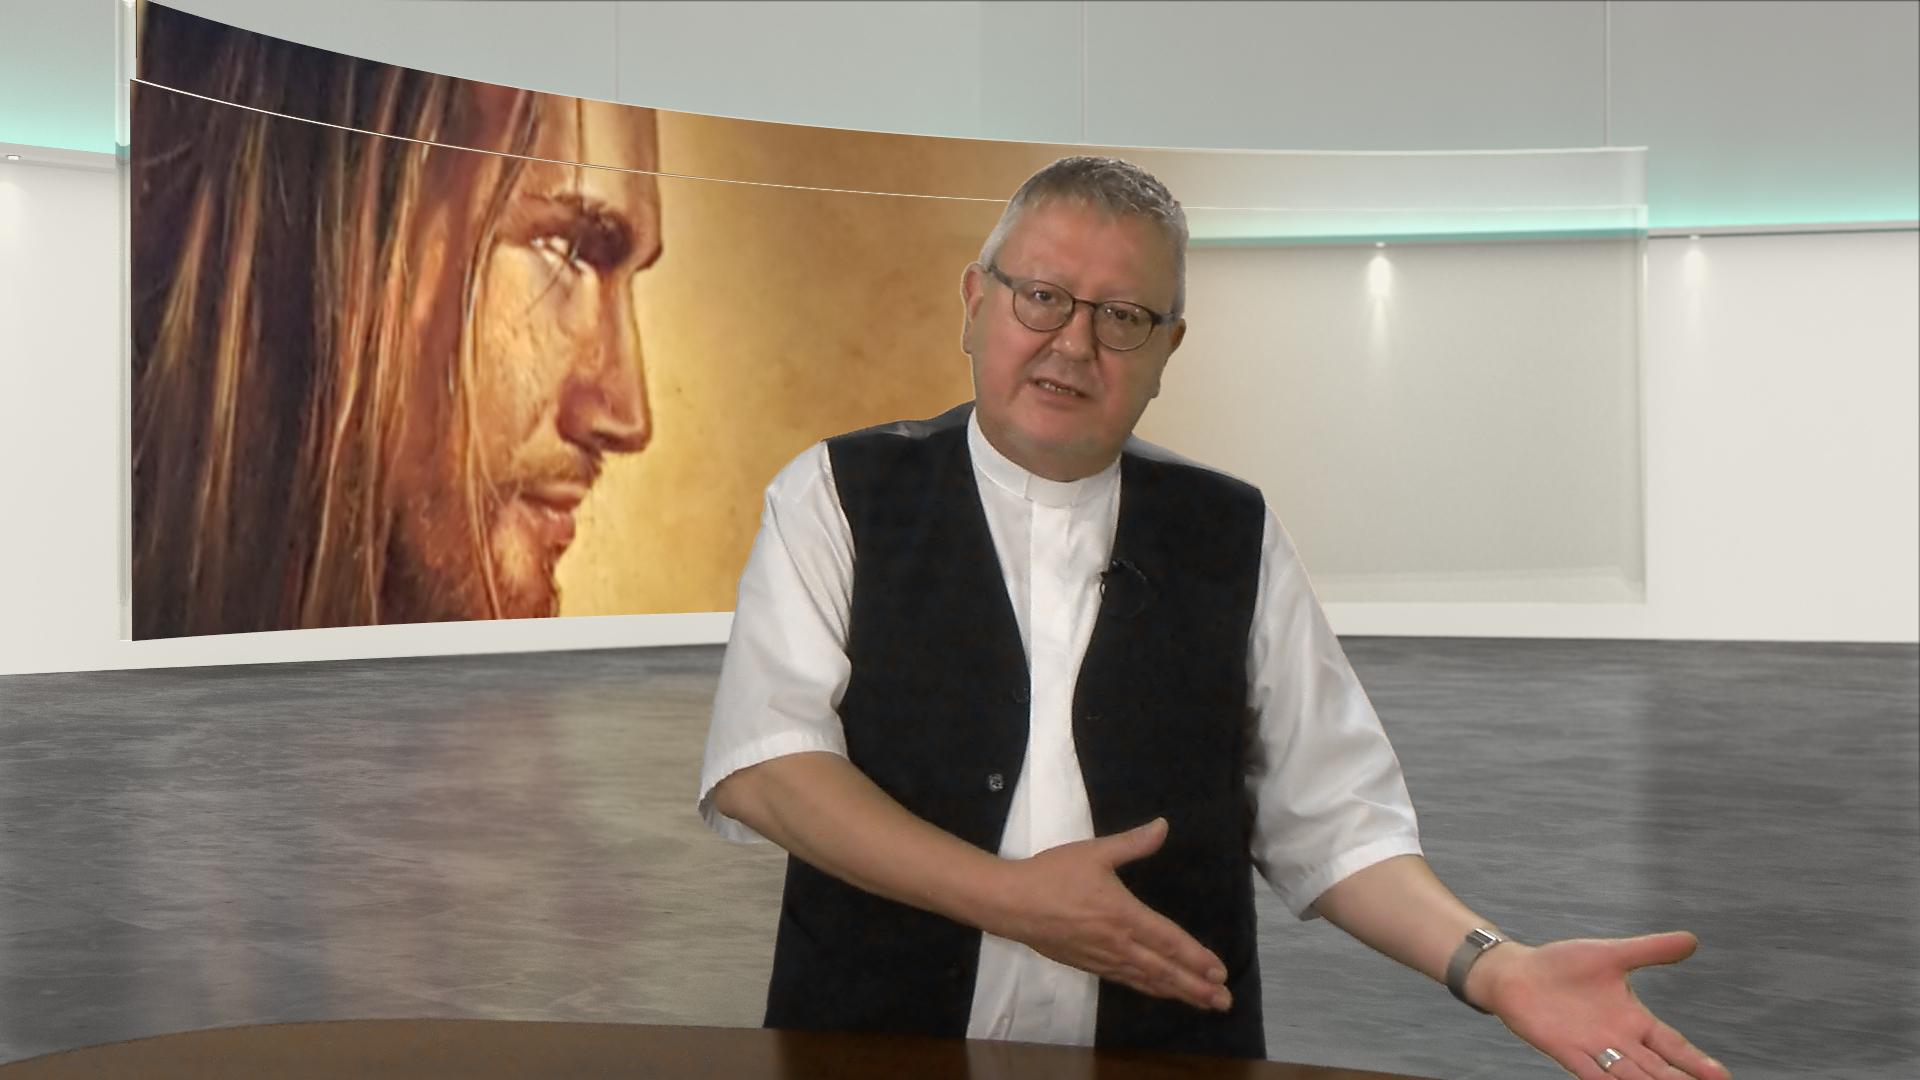 200719 Predigt Kirchgessner title